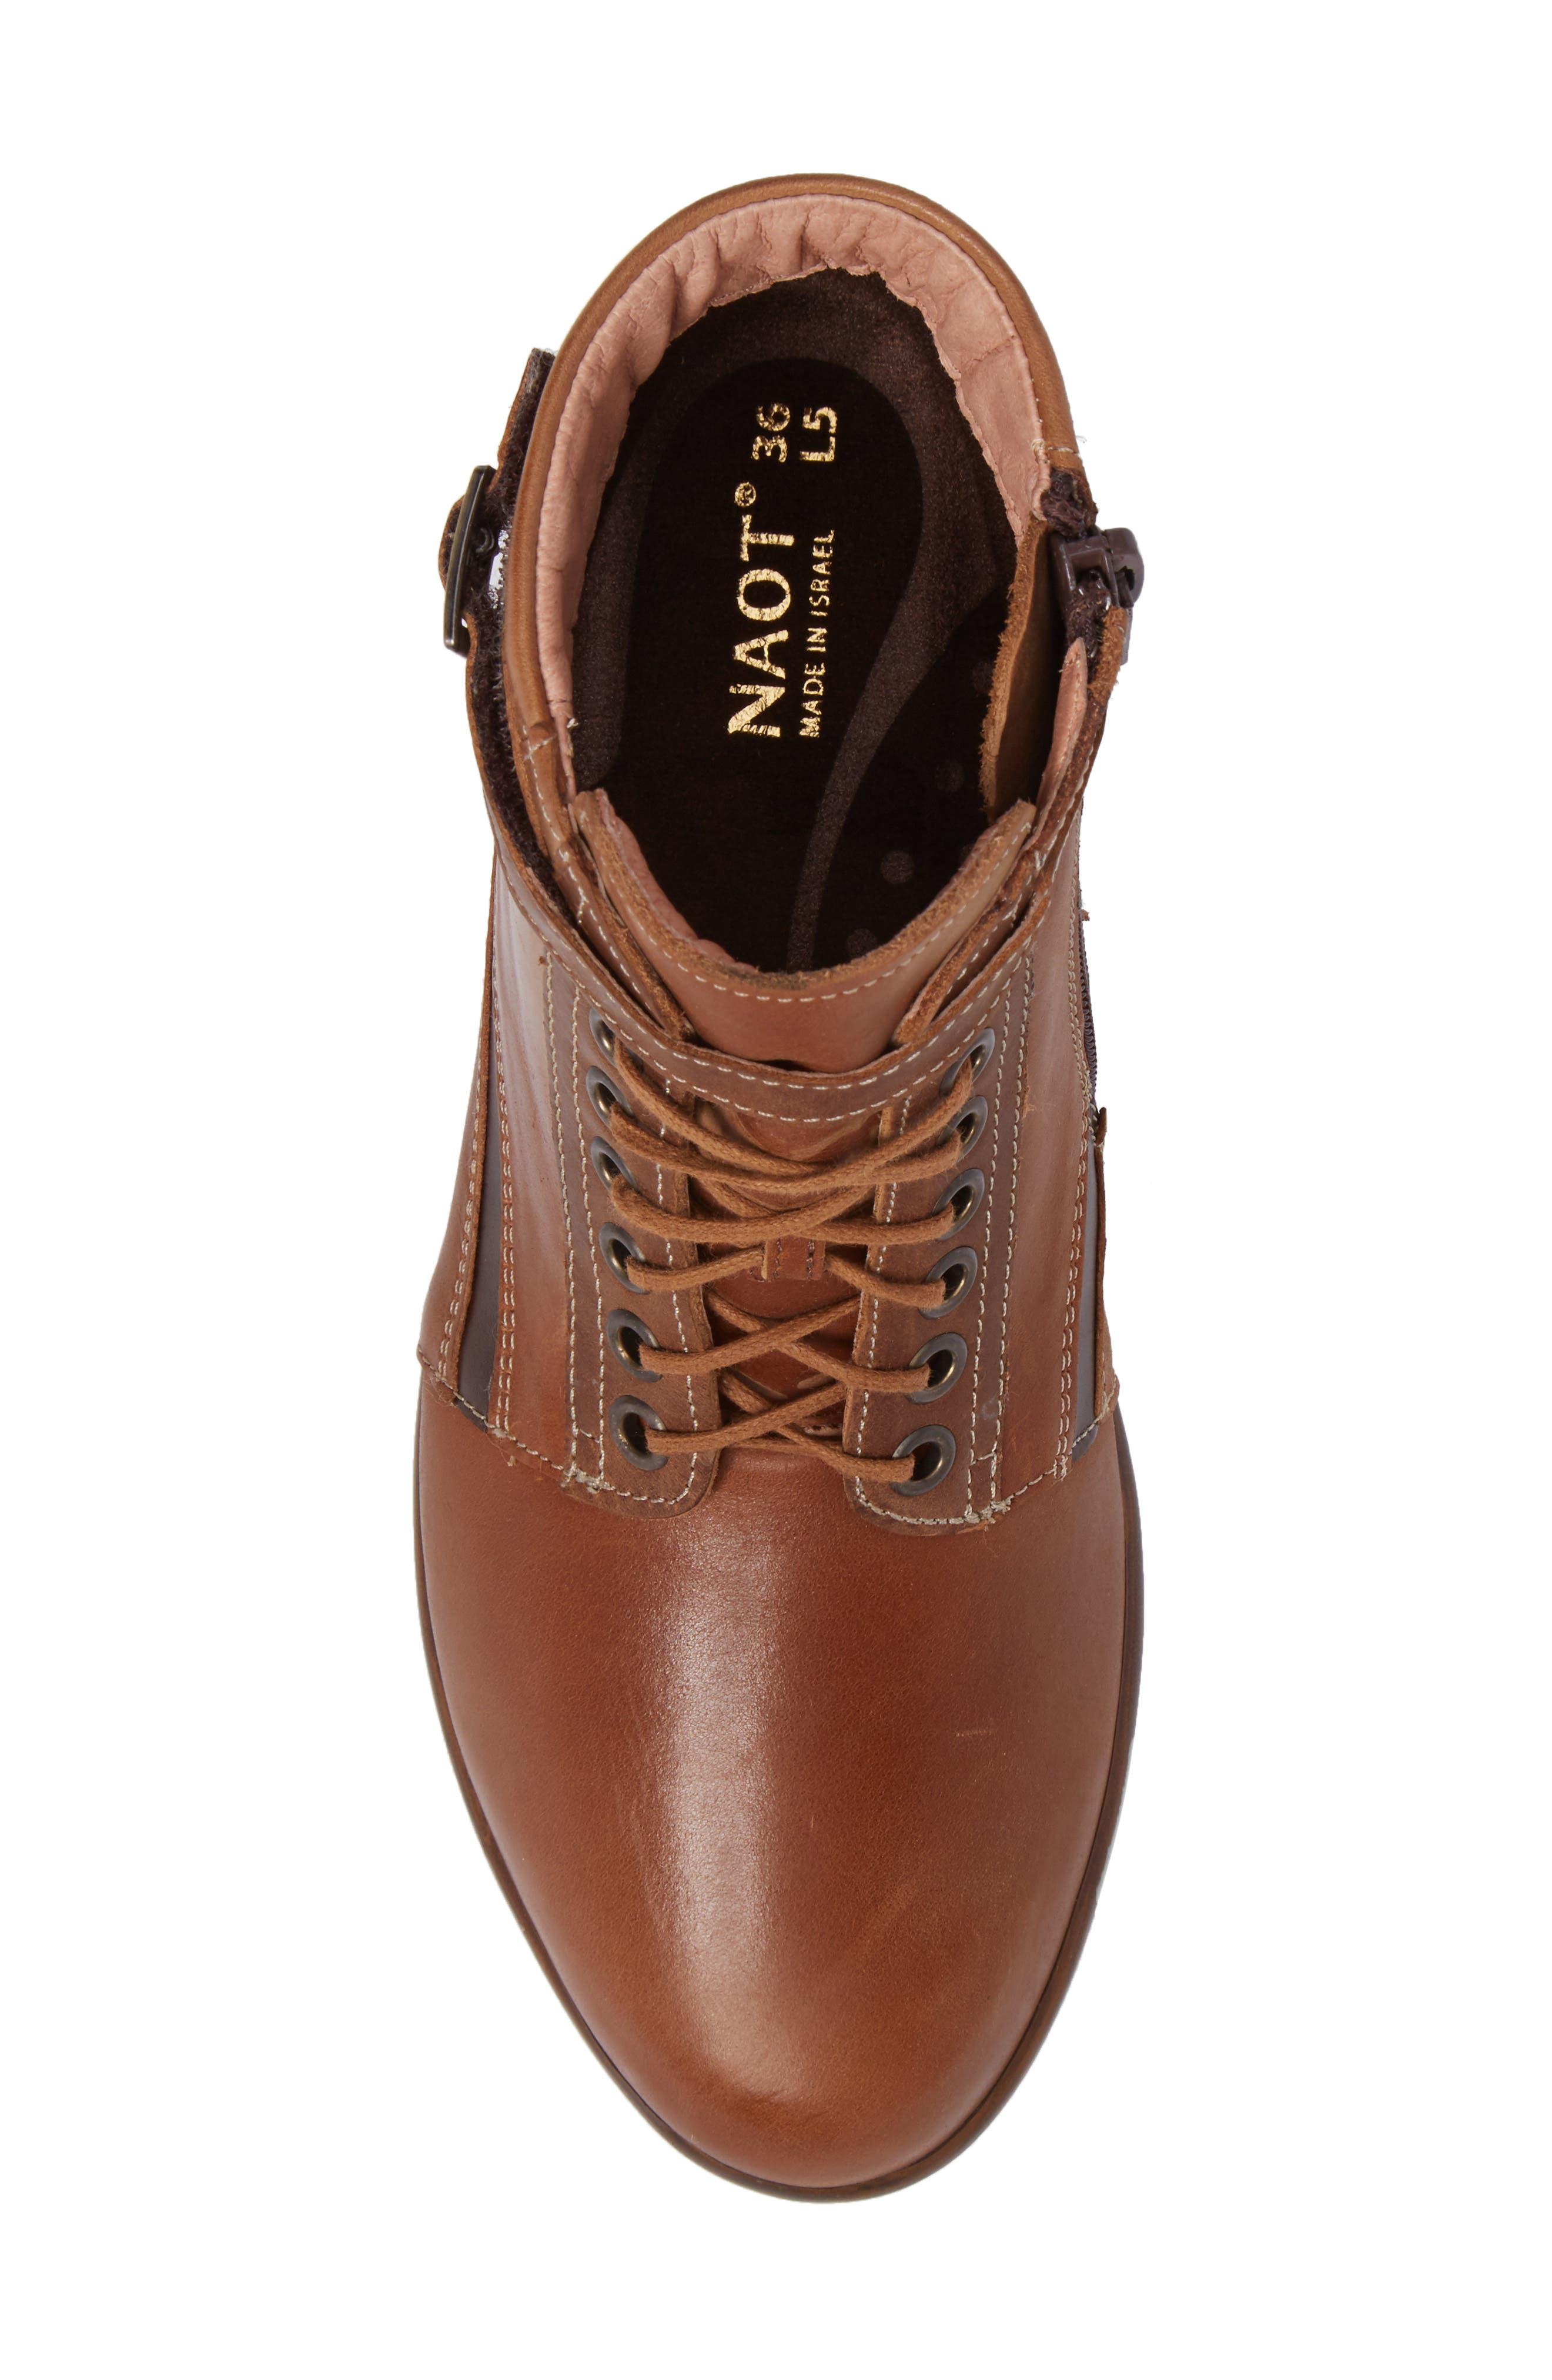 Kona Boot,                             Alternate thumbnail 5, color,                             Vintage Camel Leather